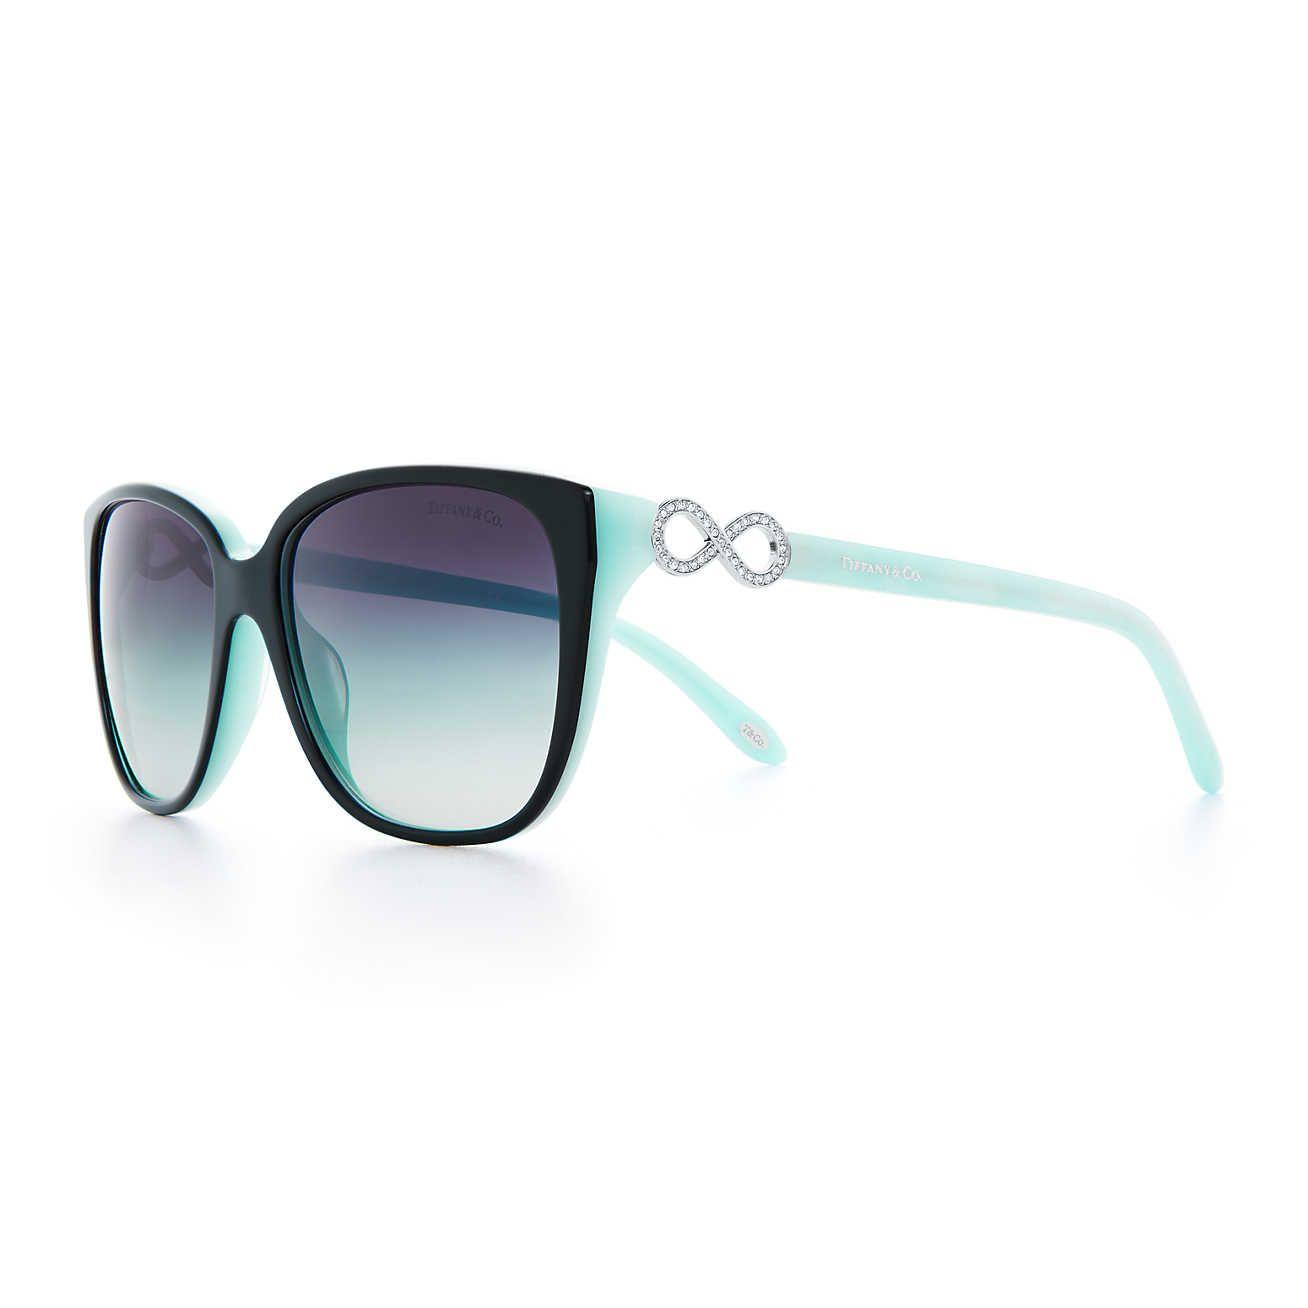 371dec61be30 Tiffany Infinity Square Sunglasses